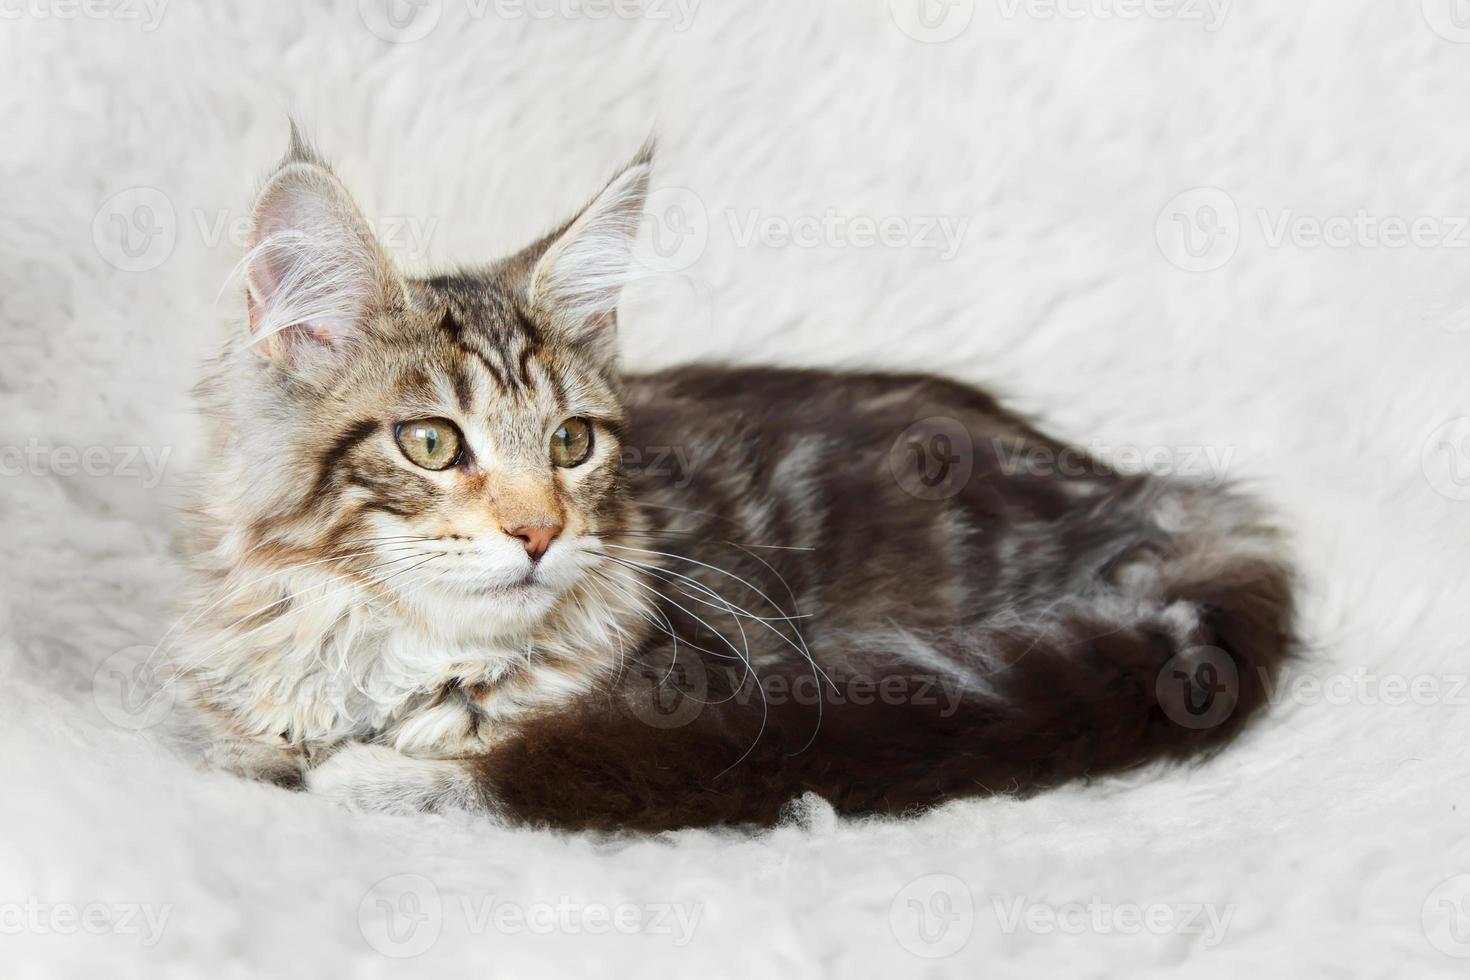 zilver zwart maine coon kitten poseren foto